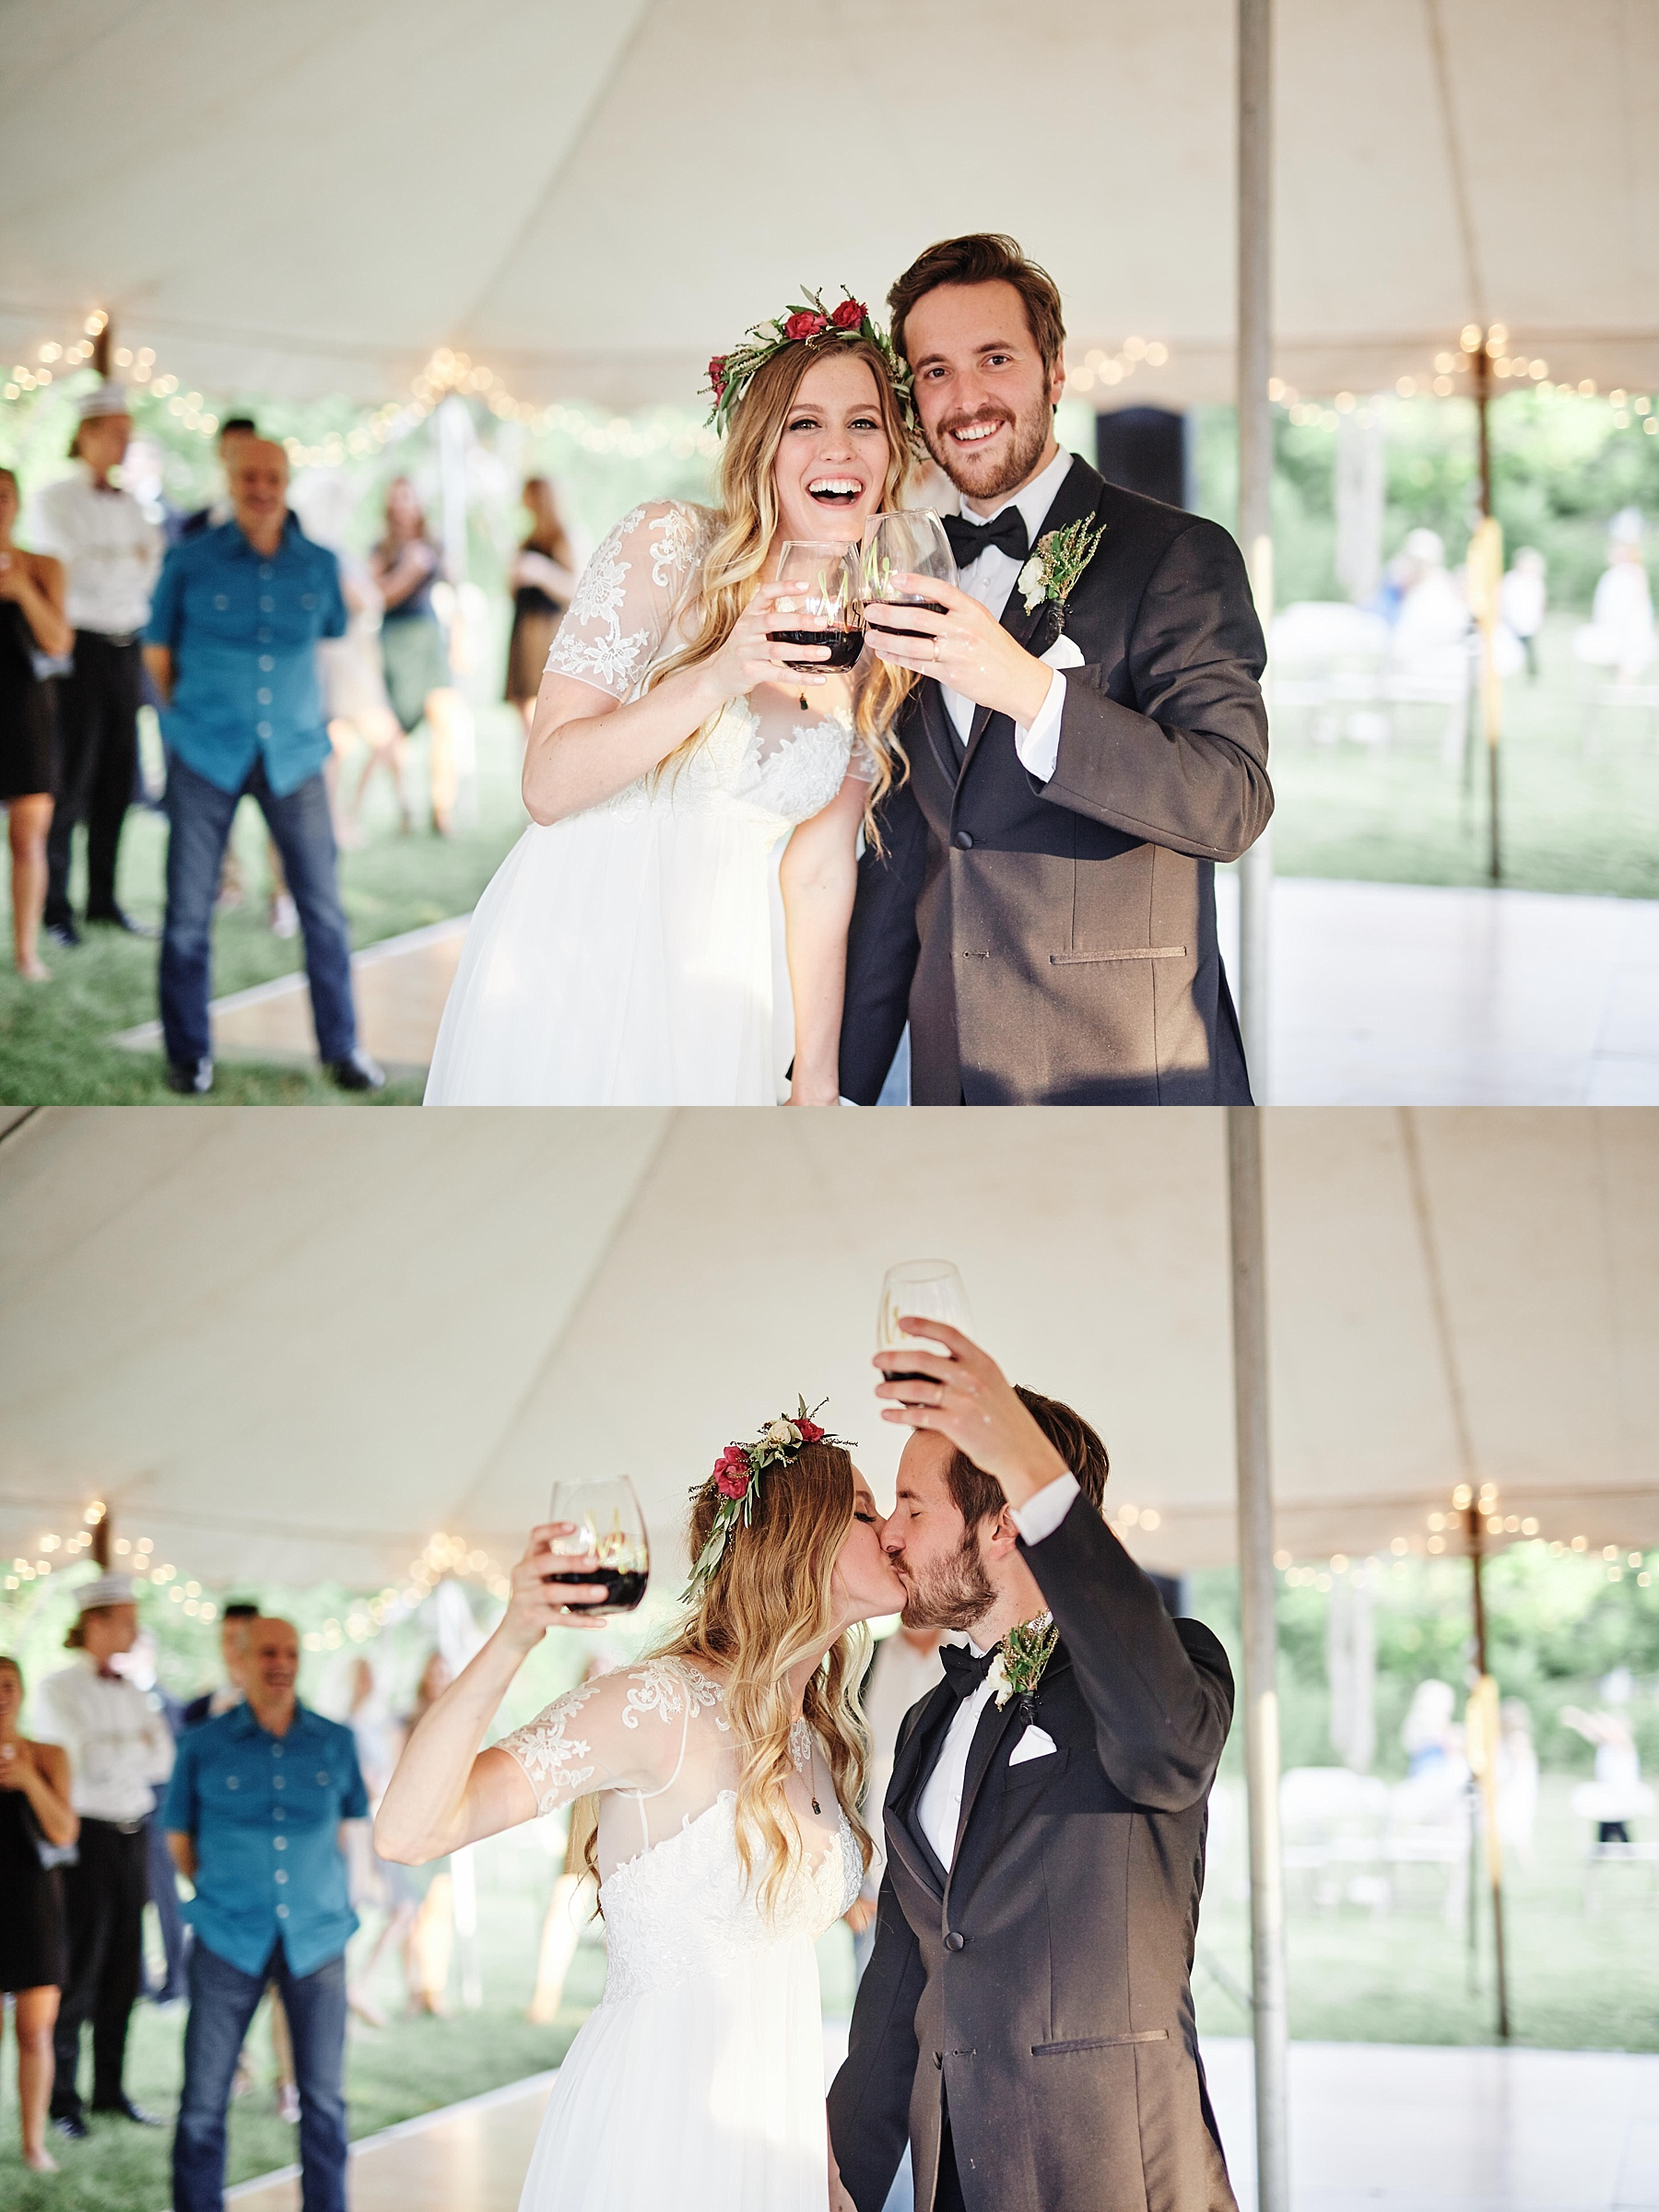 Fairhaven-Farm-South-Haven-Minnesota-Barn-Outdoor-Wedding-Josh-Kailey_1031.jpg